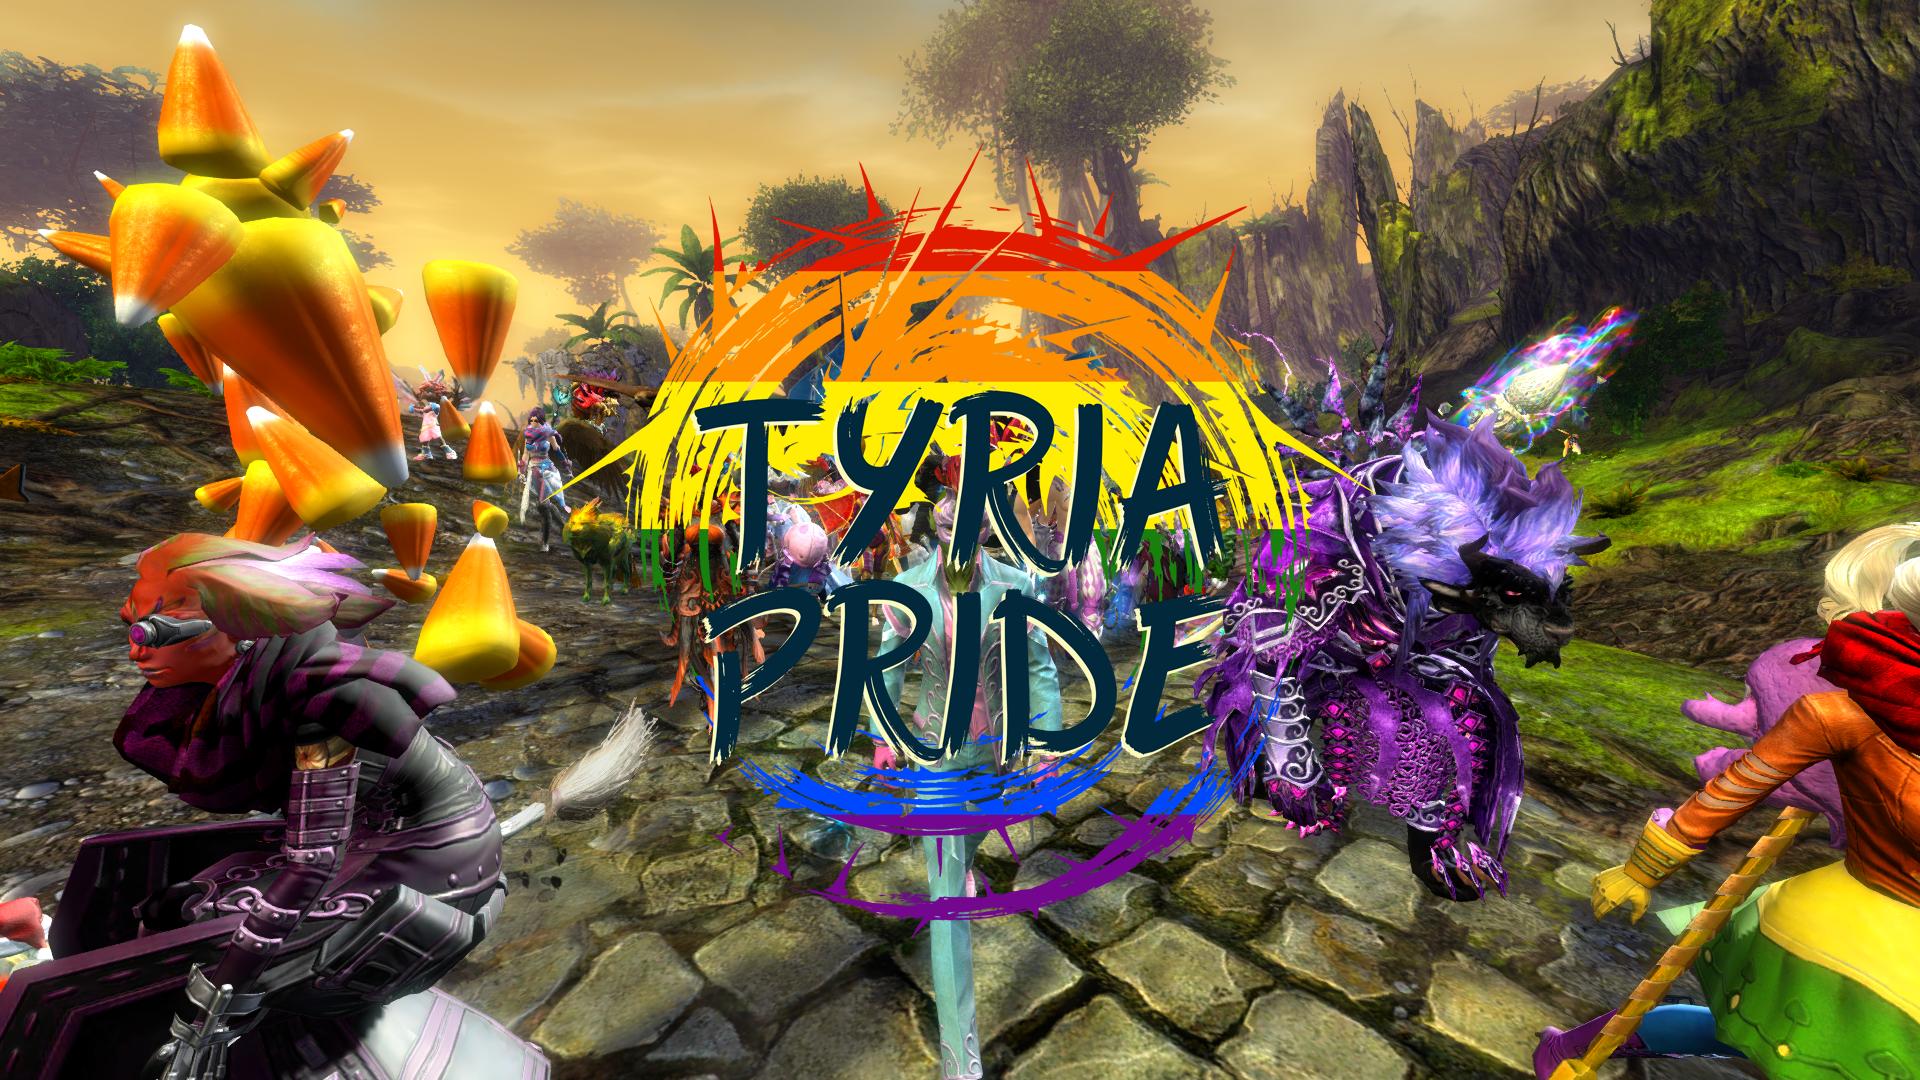 Tyria Pride HoT